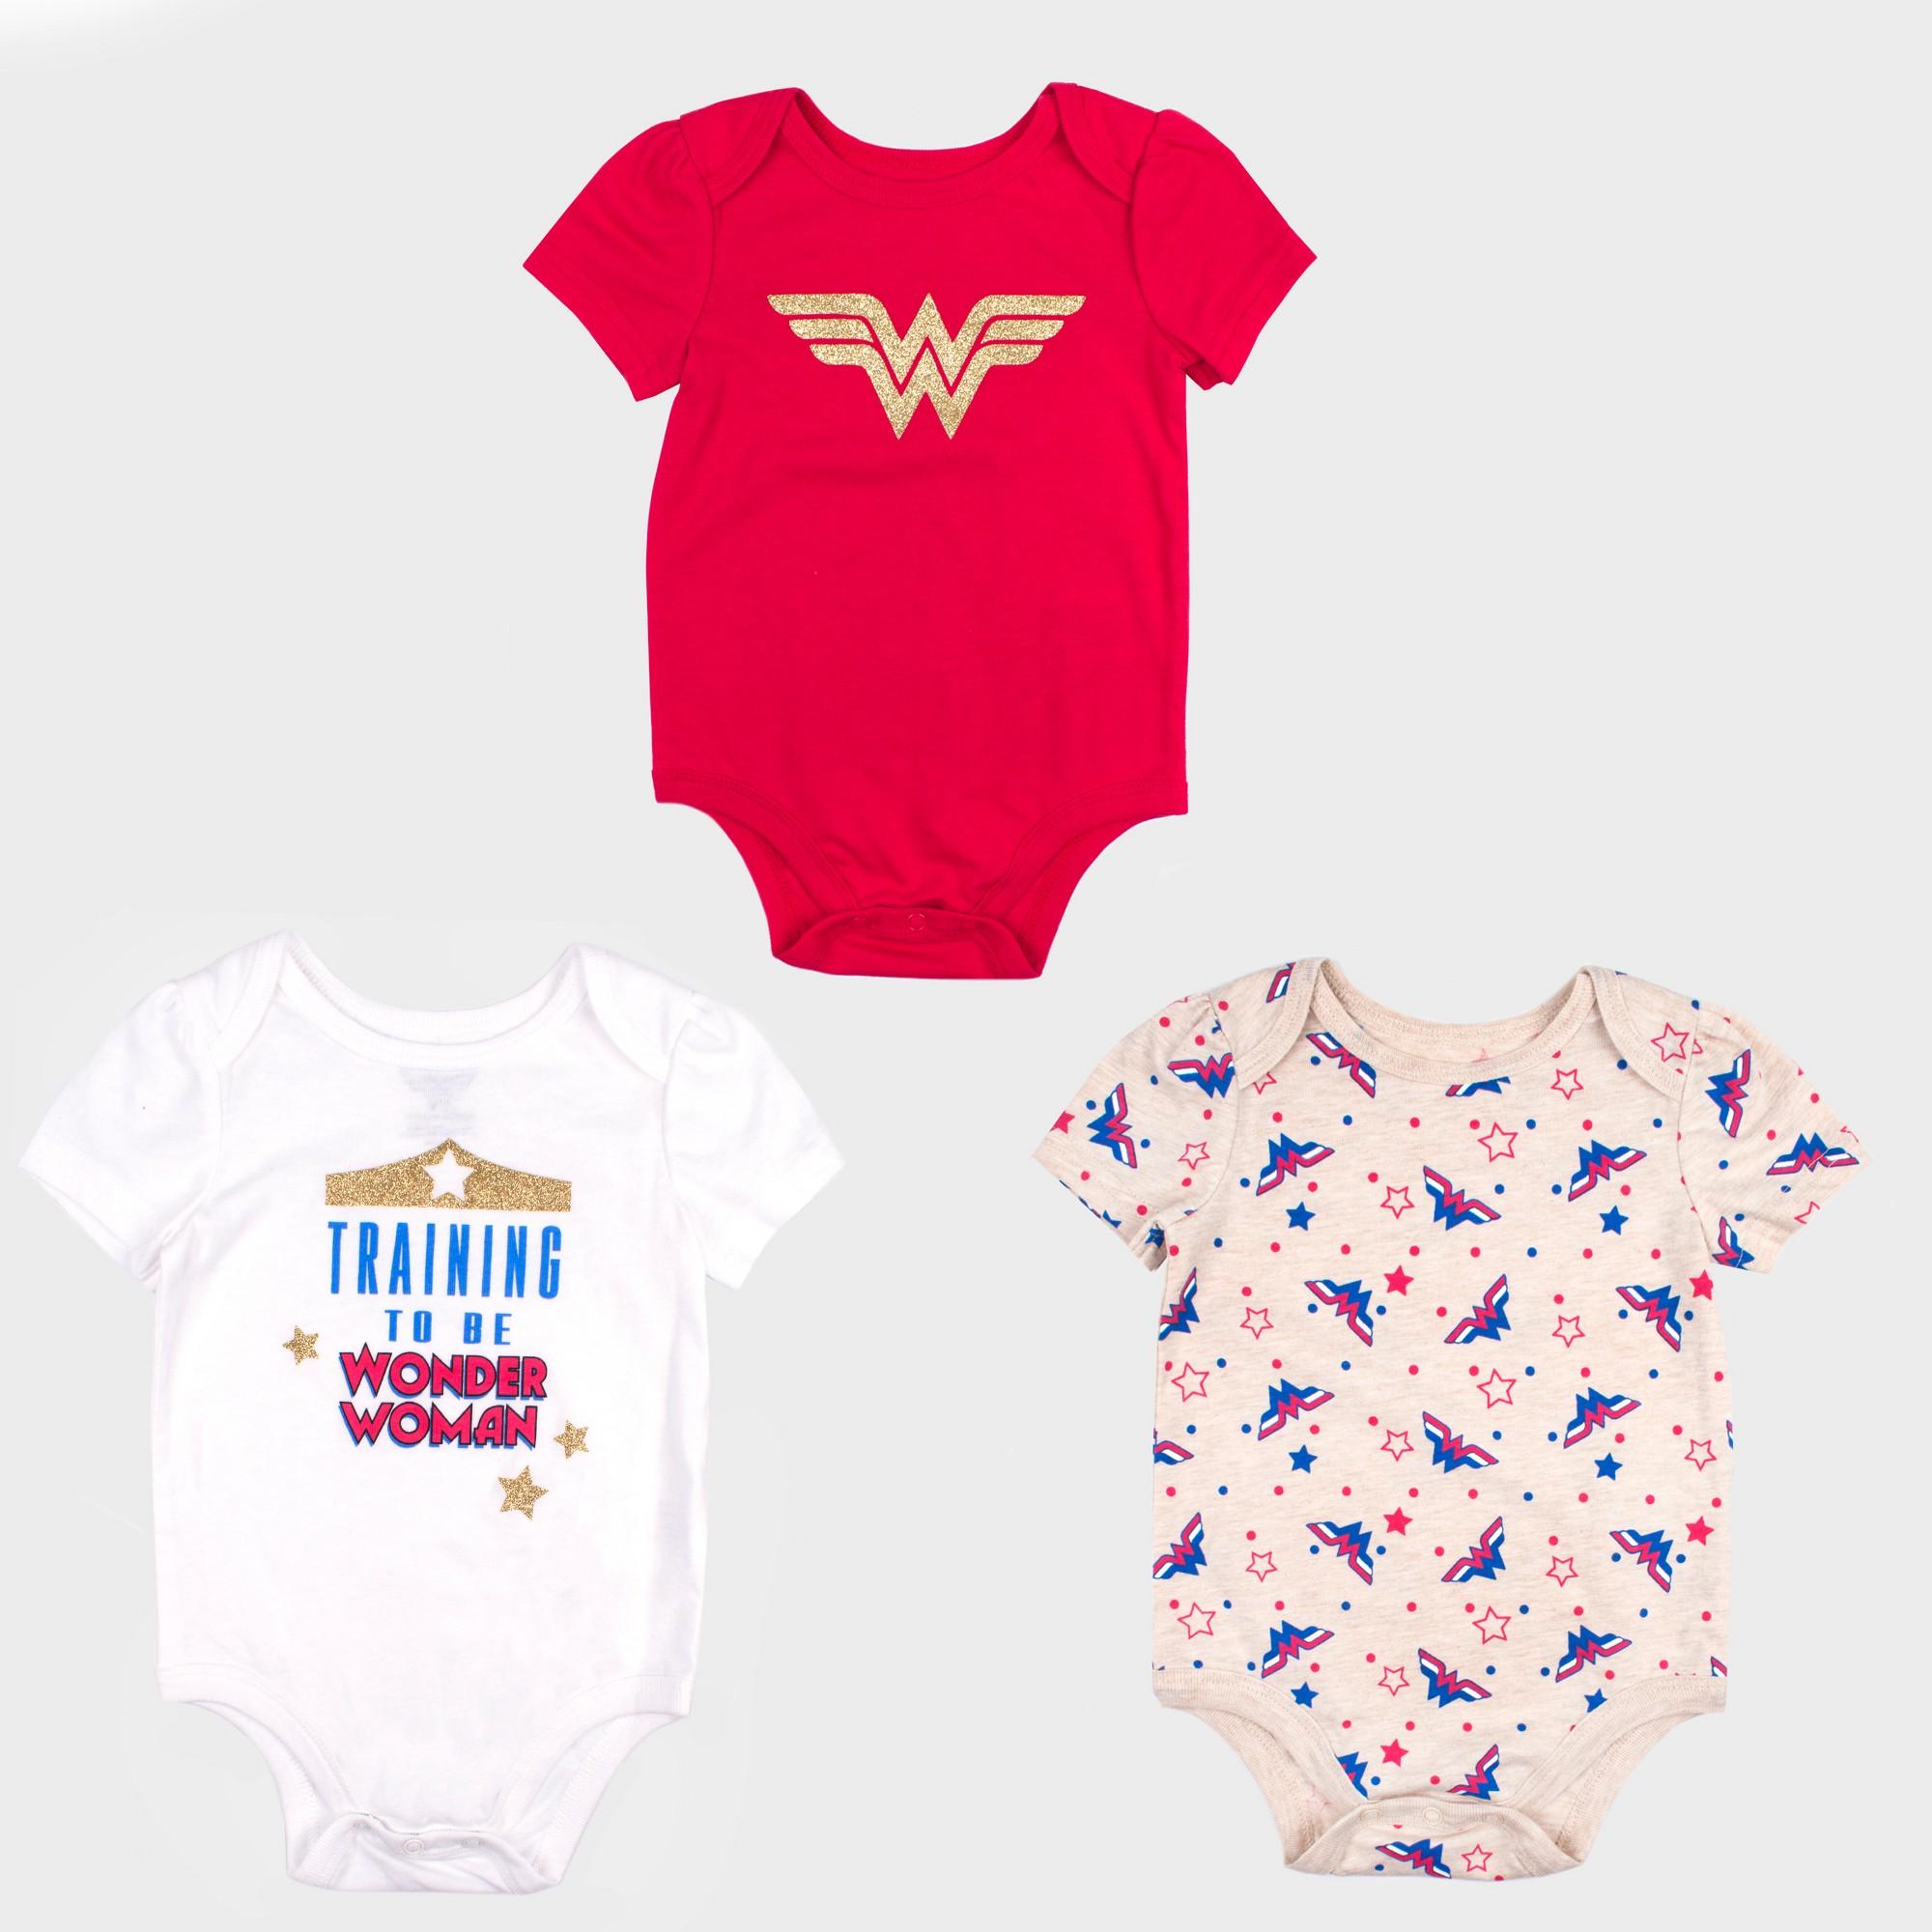 petiteBaby Girls' 3pk DC Comics Wonder Woman Short Sleeve Bodysuit Set - Red/White Newborn, Girl's